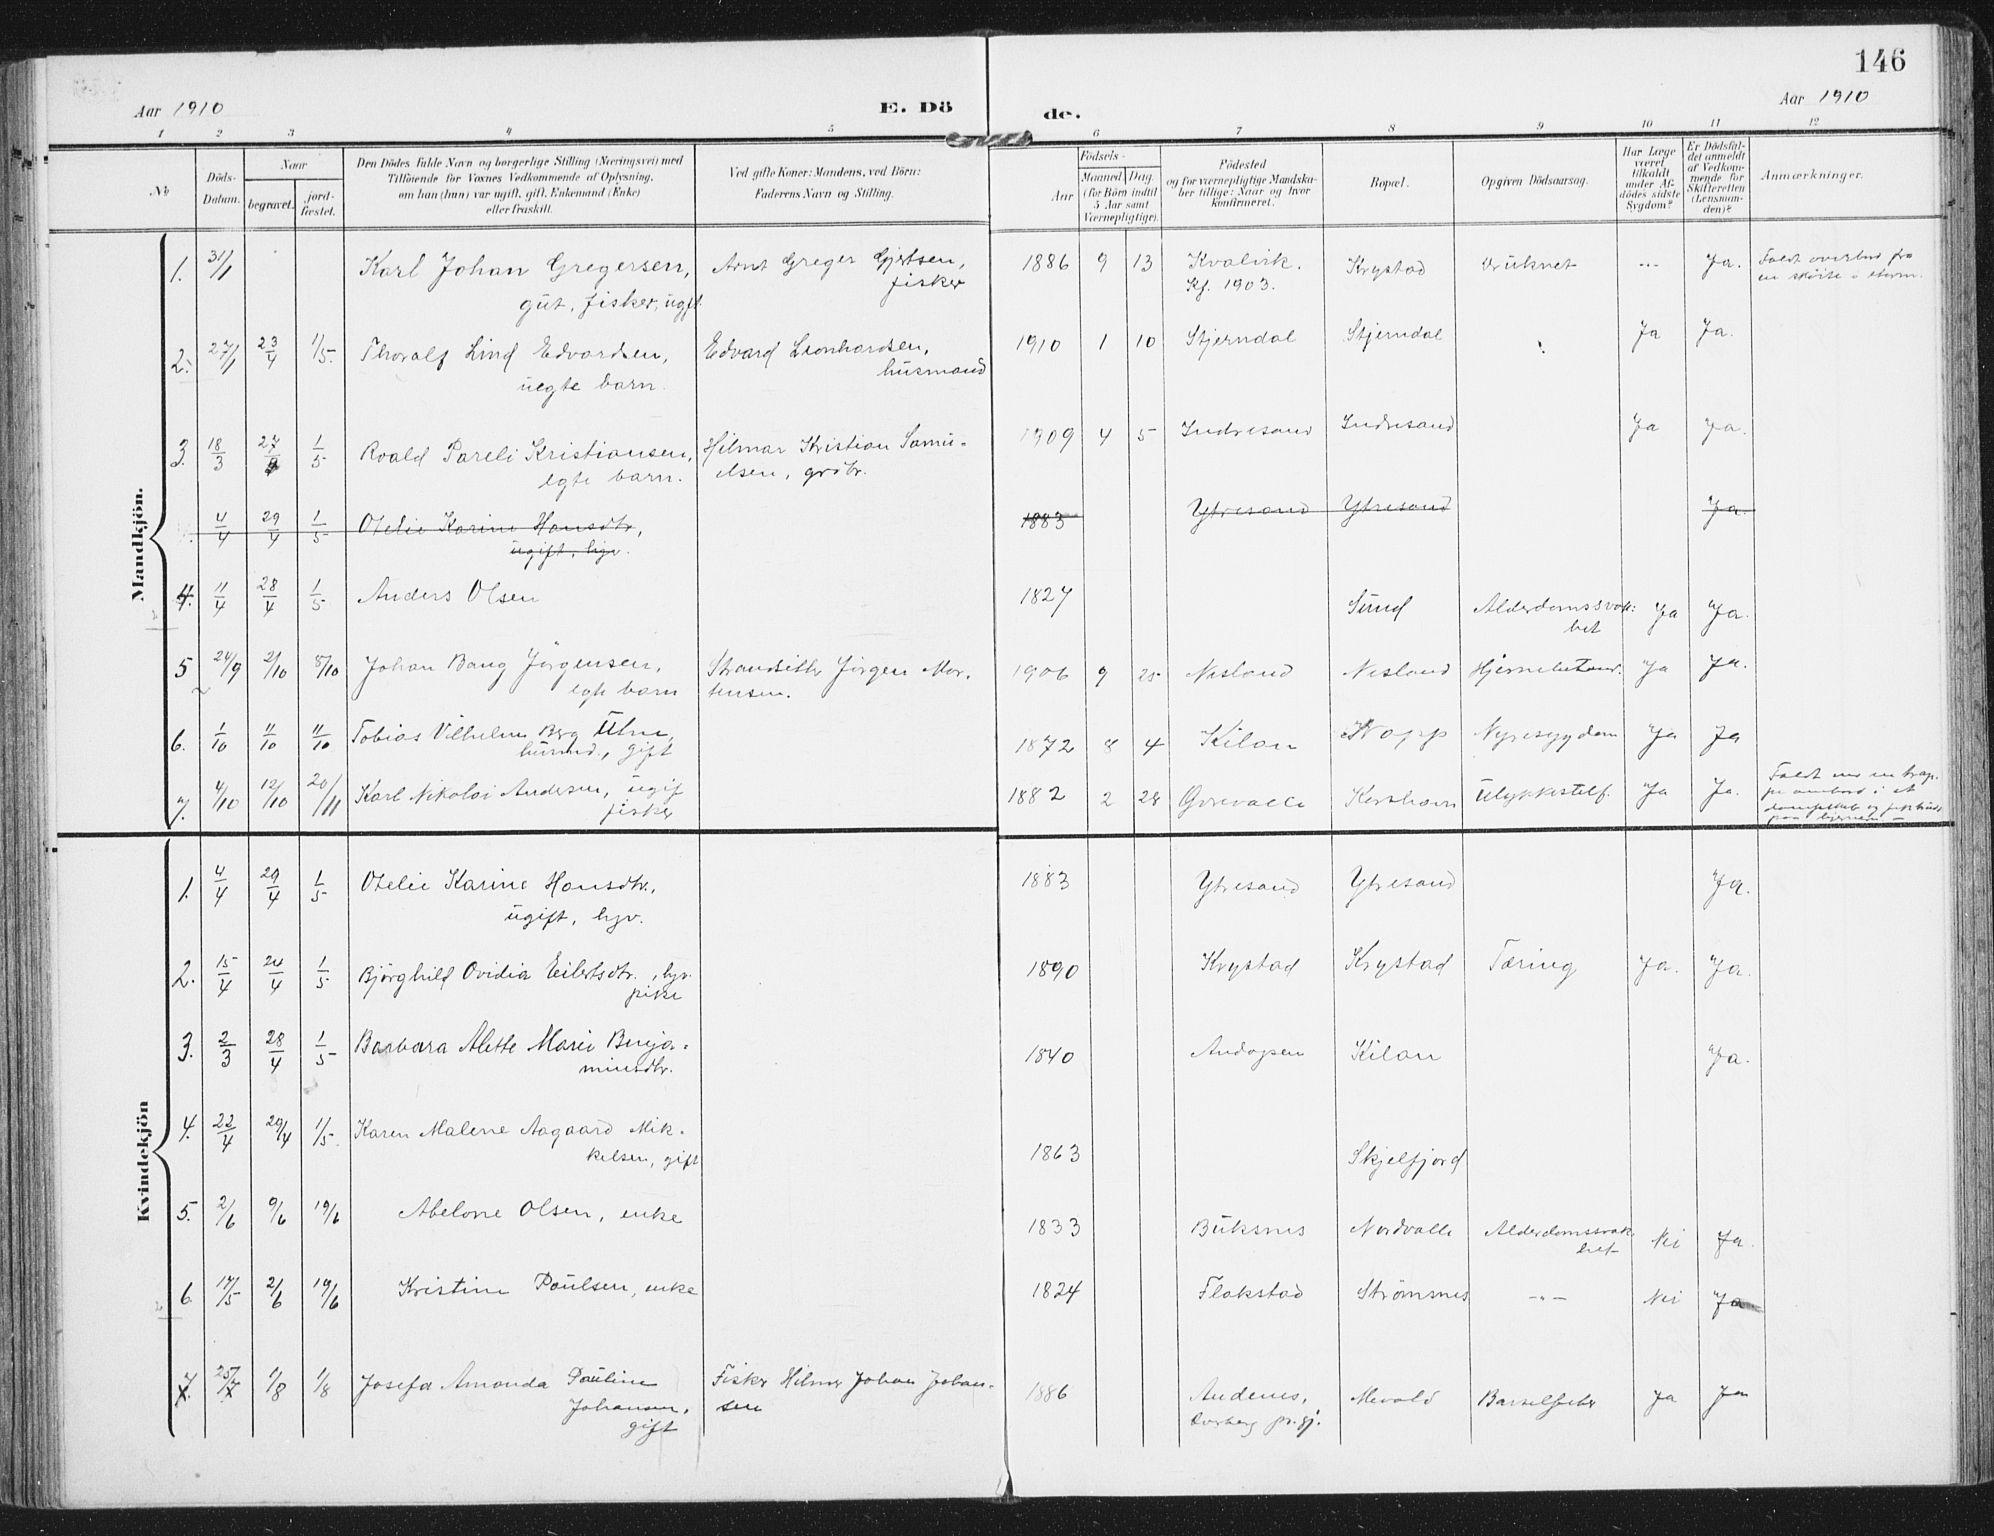 SAT, Ministerialprotokoller, klokkerbøker og fødselsregistre - Nordland, 885/L1206: Ministerialbok nr. 885A07, 1905-1915, s. 146